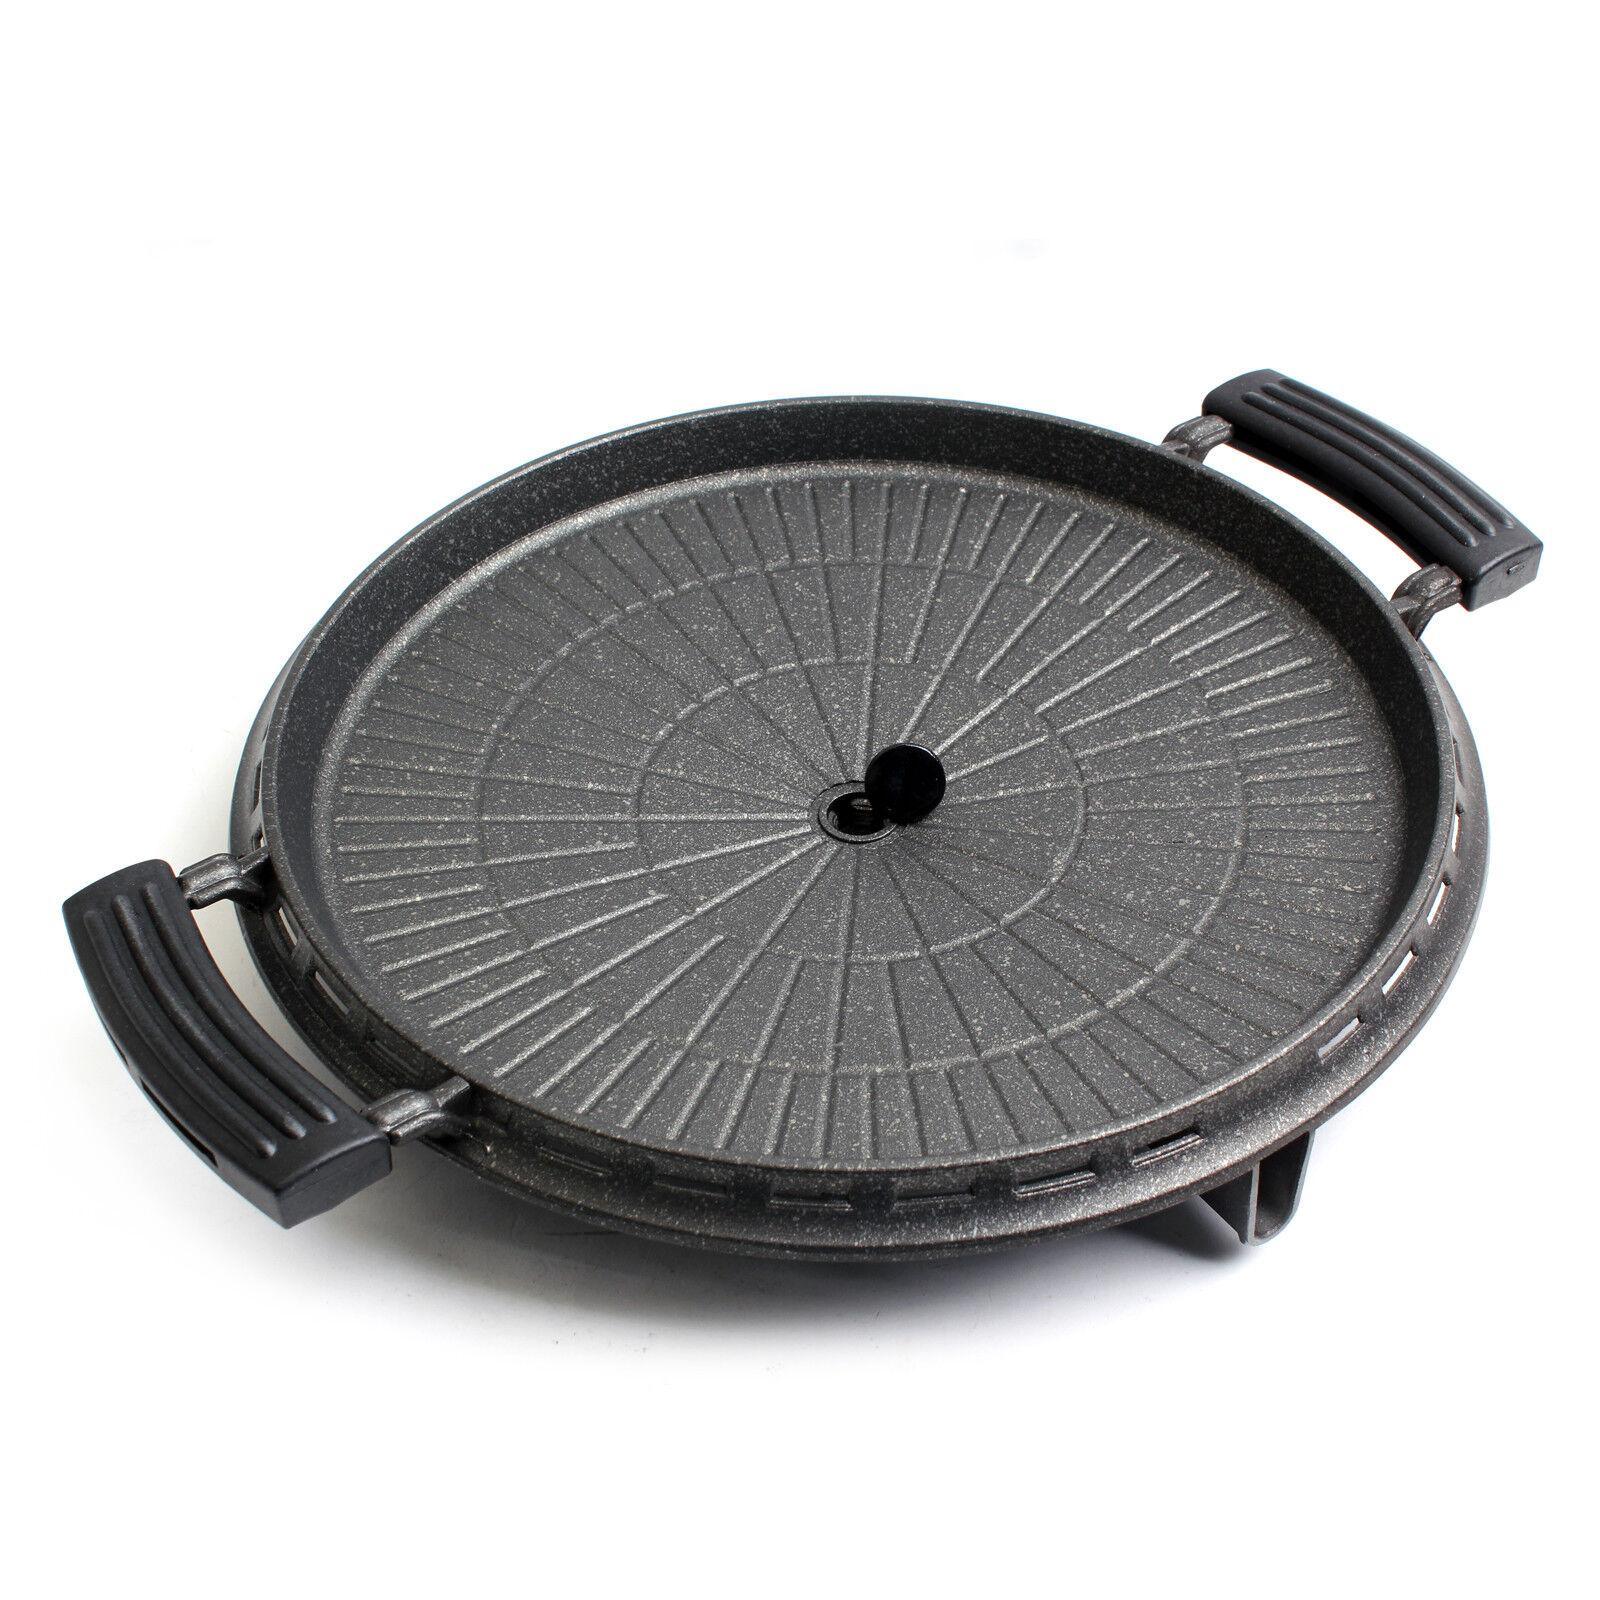 BBQ Grill Ribs Pork Belly Grill Pan Round Aluminum Round Pan 35cm KOREA 0d0410